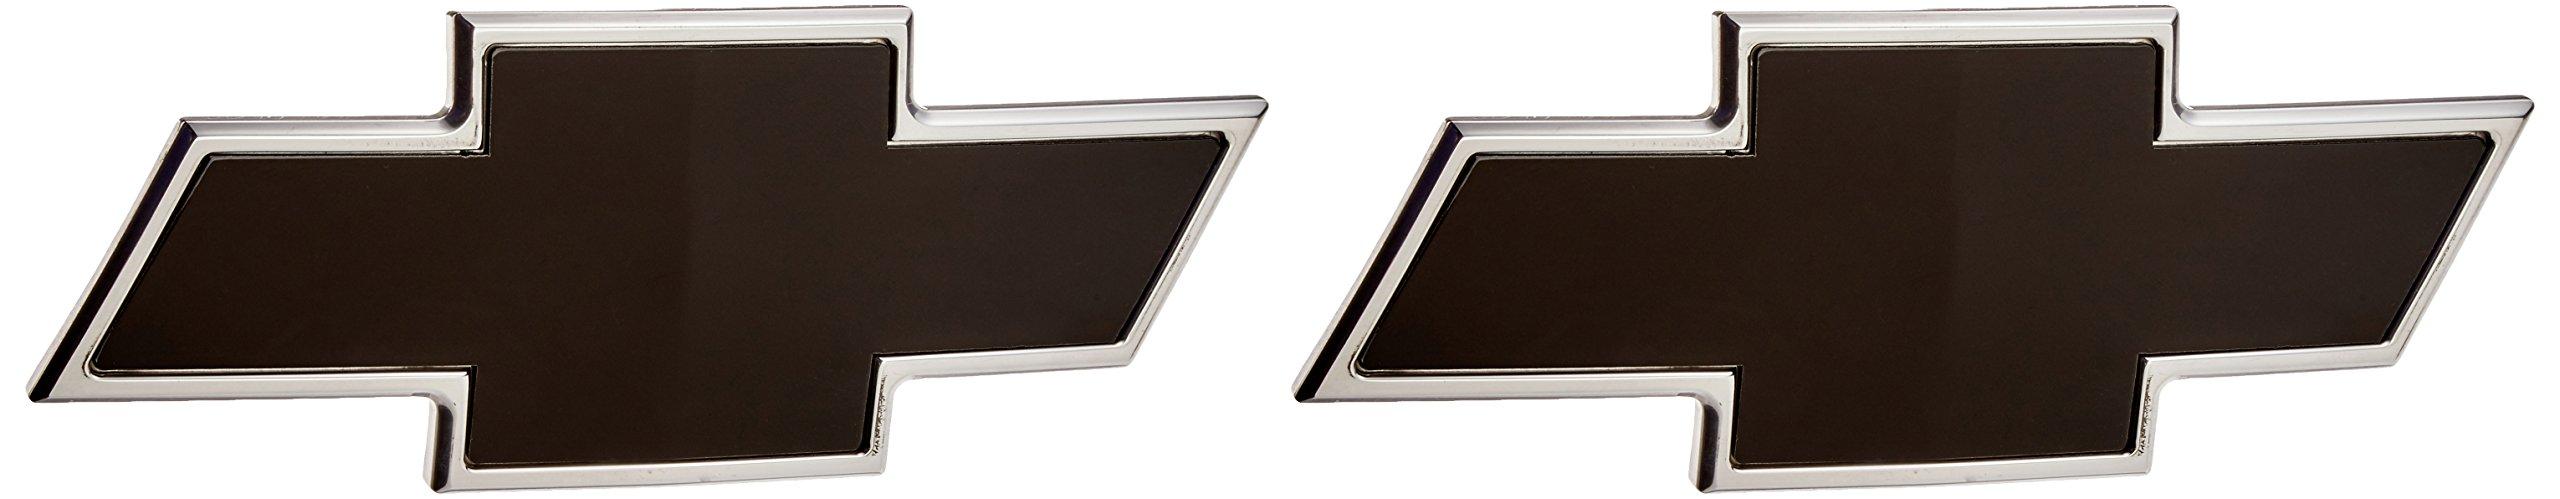 AMI 96101KP Chevy Bowtie Grille & Tailgate Emblem - Polished/Black Powder coat, 2 Pack